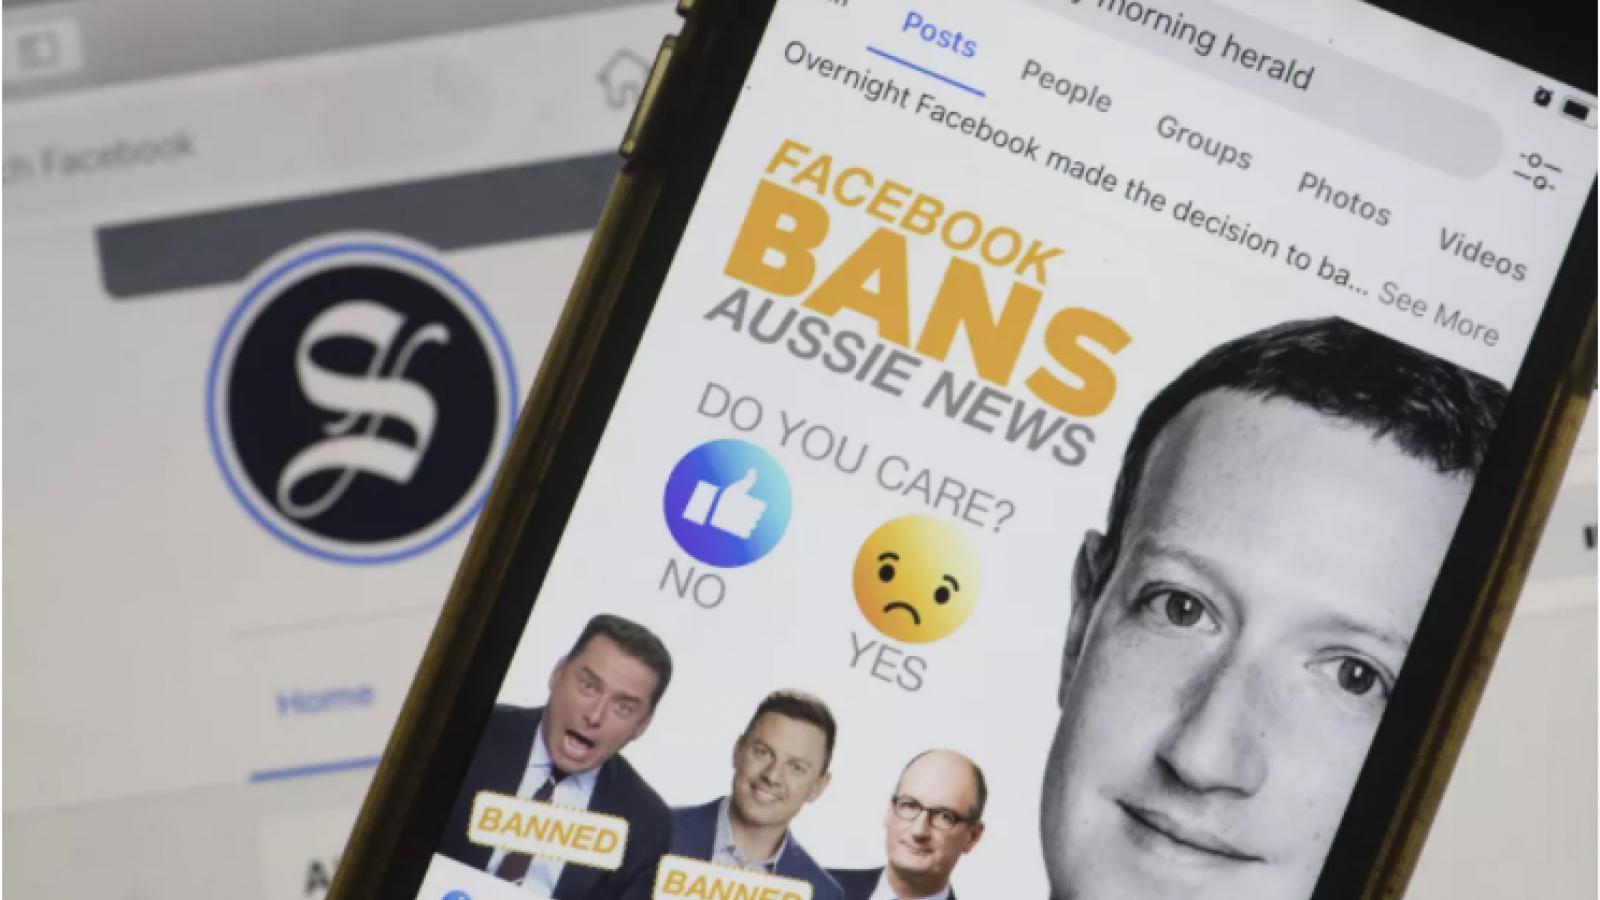 Facebook - nguồn phát tán tin giả tồi tệ nhất